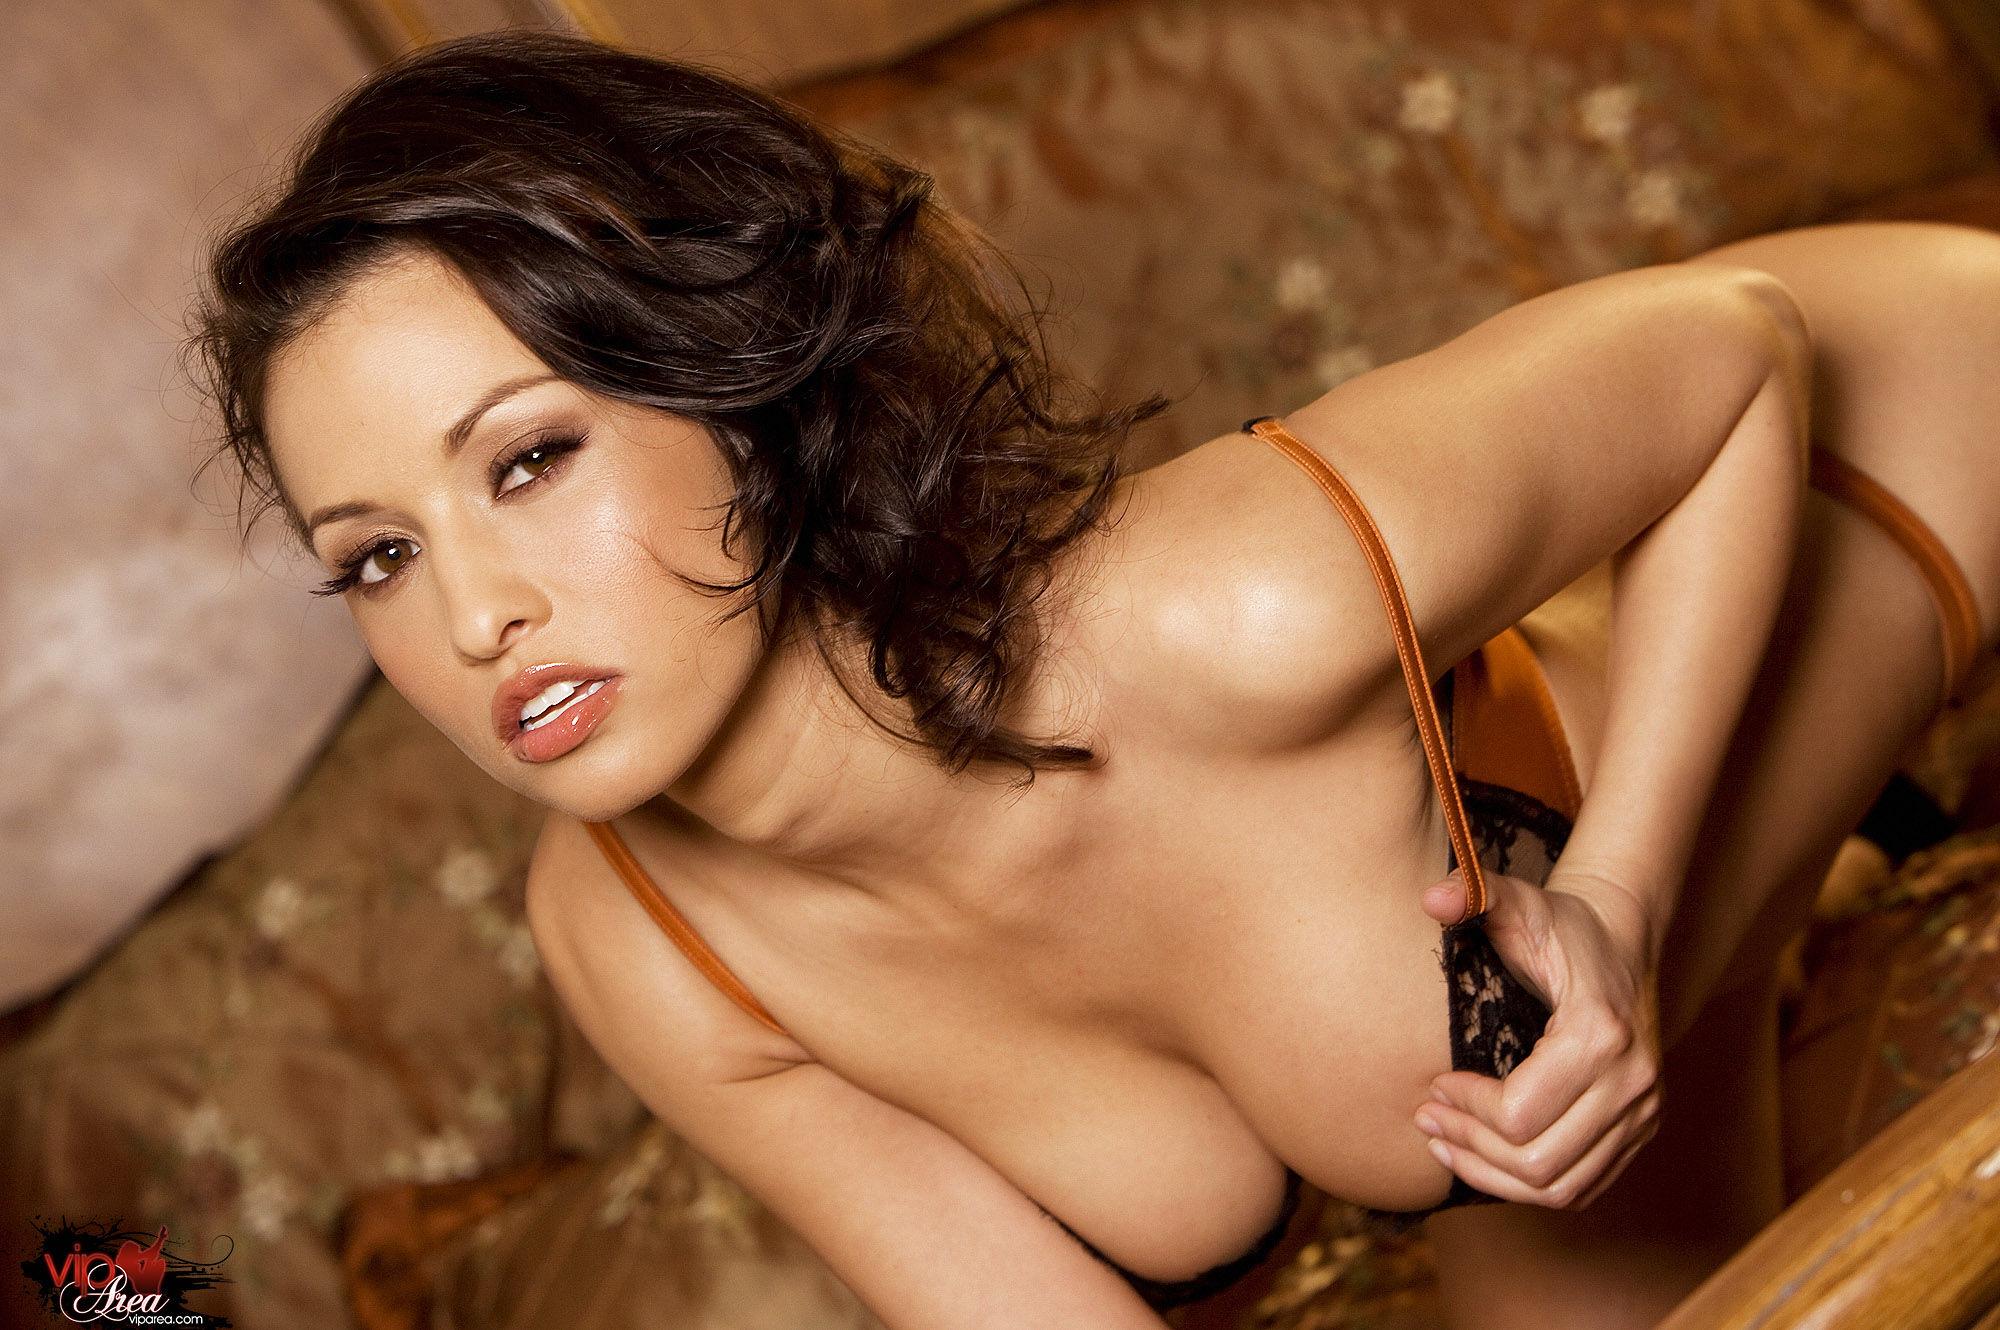 taylor kitsch porn video